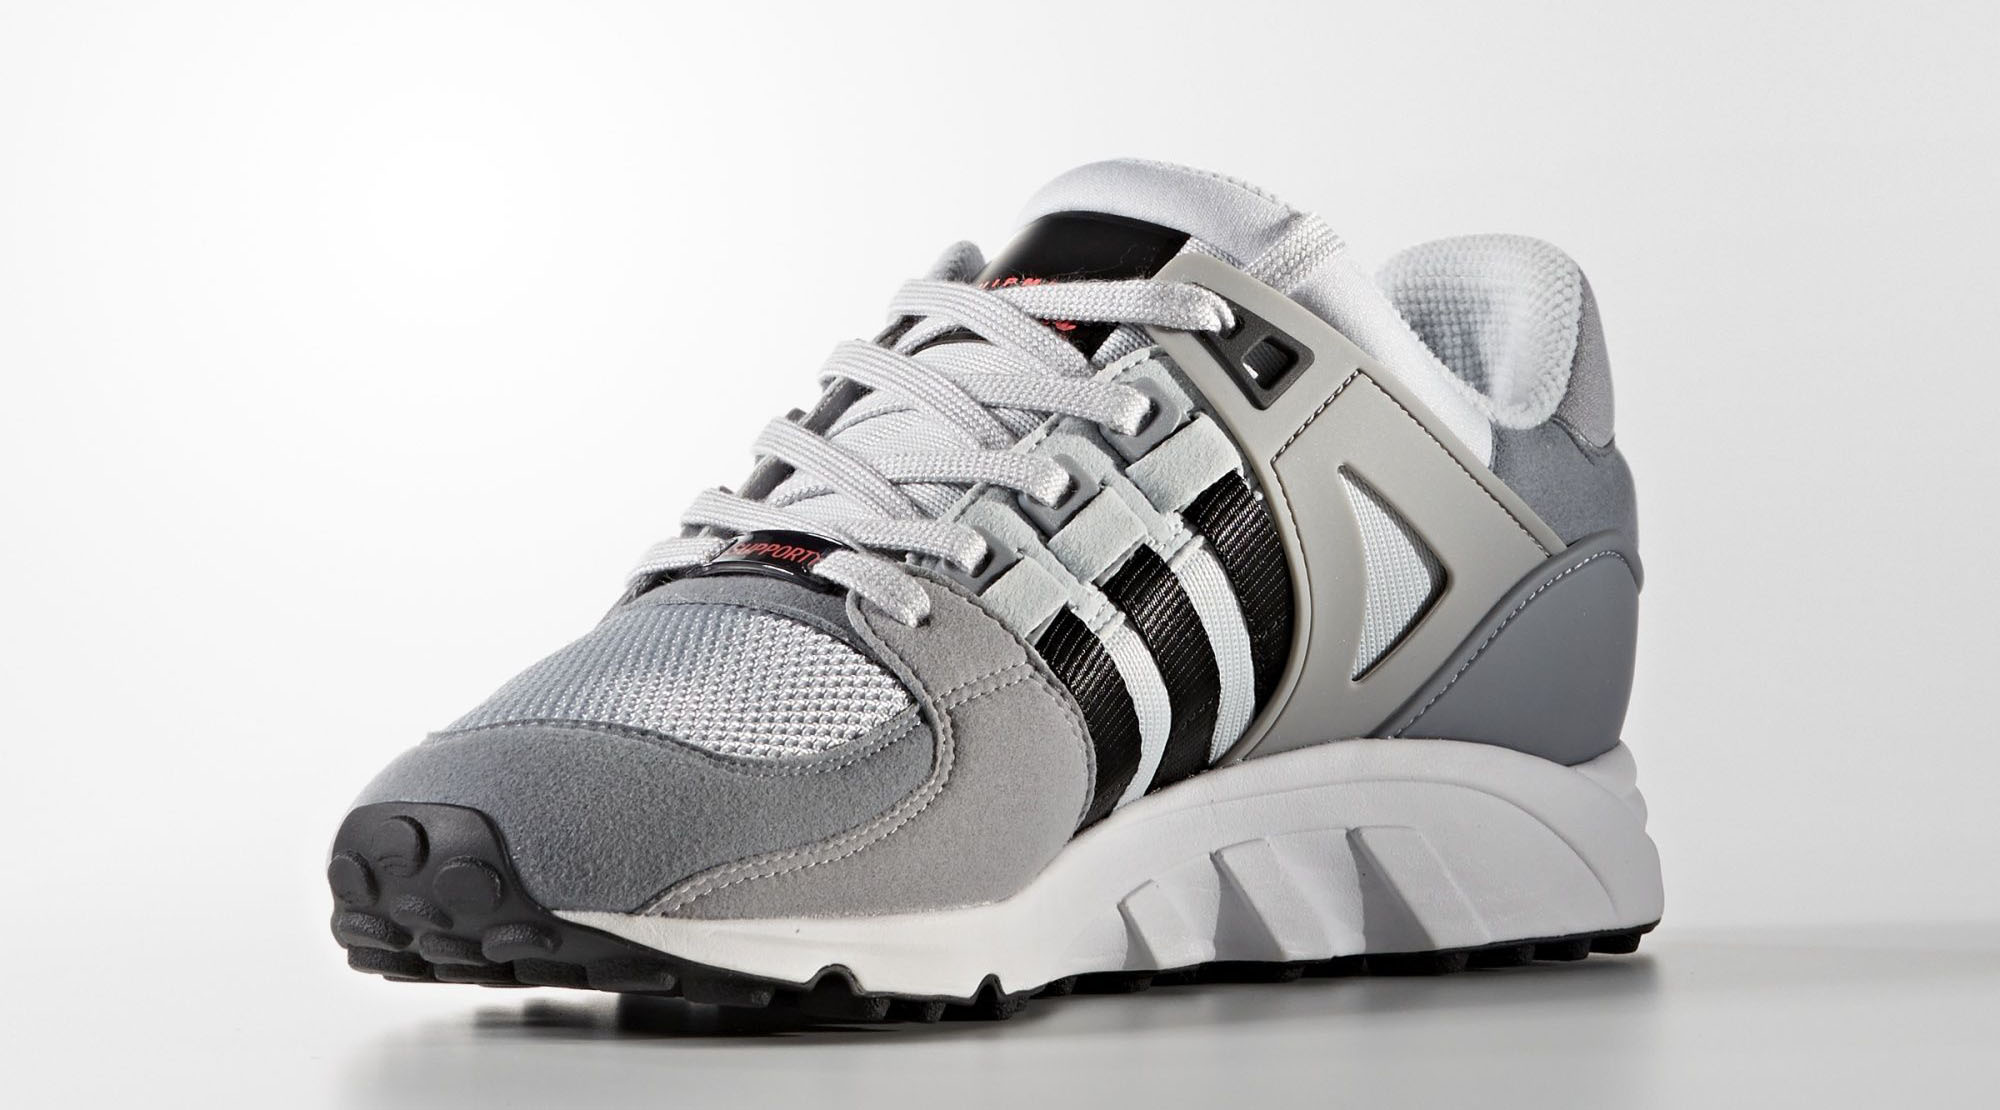 Adidas EQT Support RF Light Onix Grey